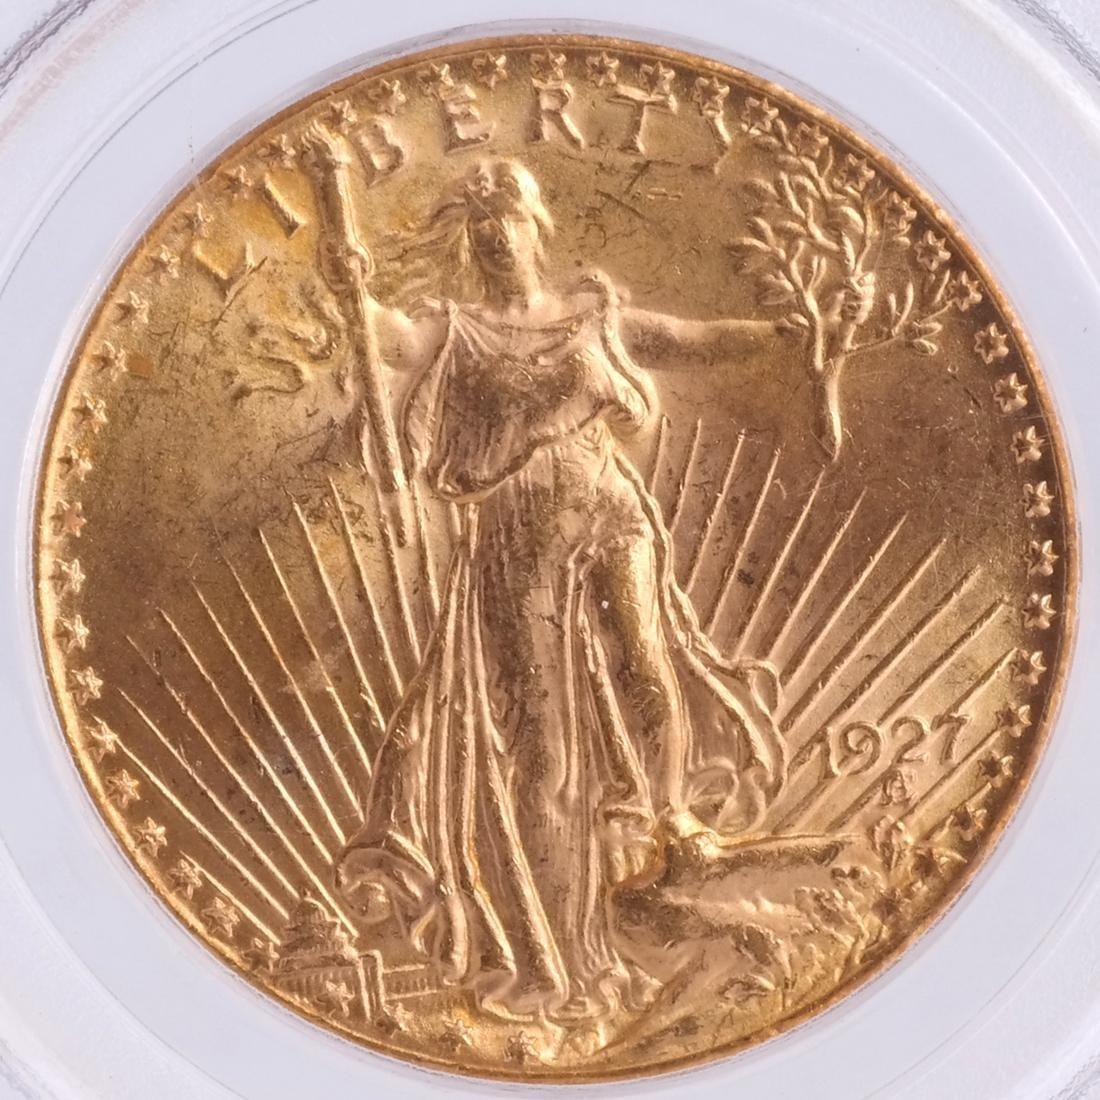 1927 $20 Gold Saint Gaudens, MS 64